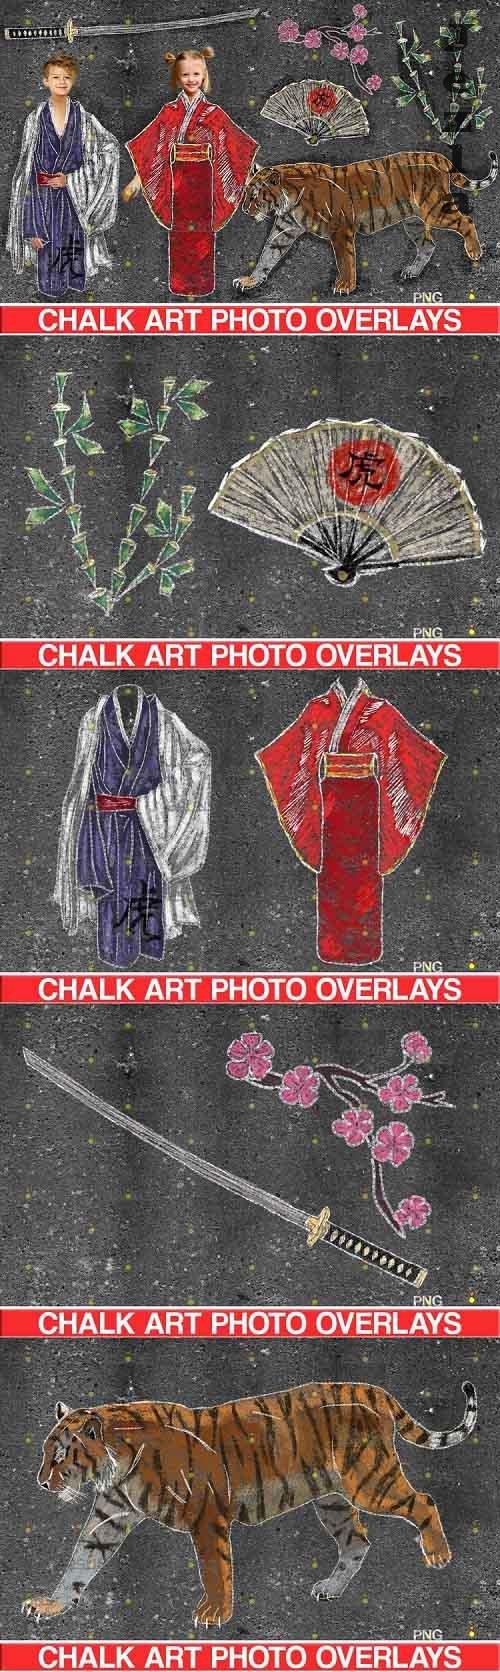 Sidewalk chalk overlay Japan, kimono overlay tiza  - 709624